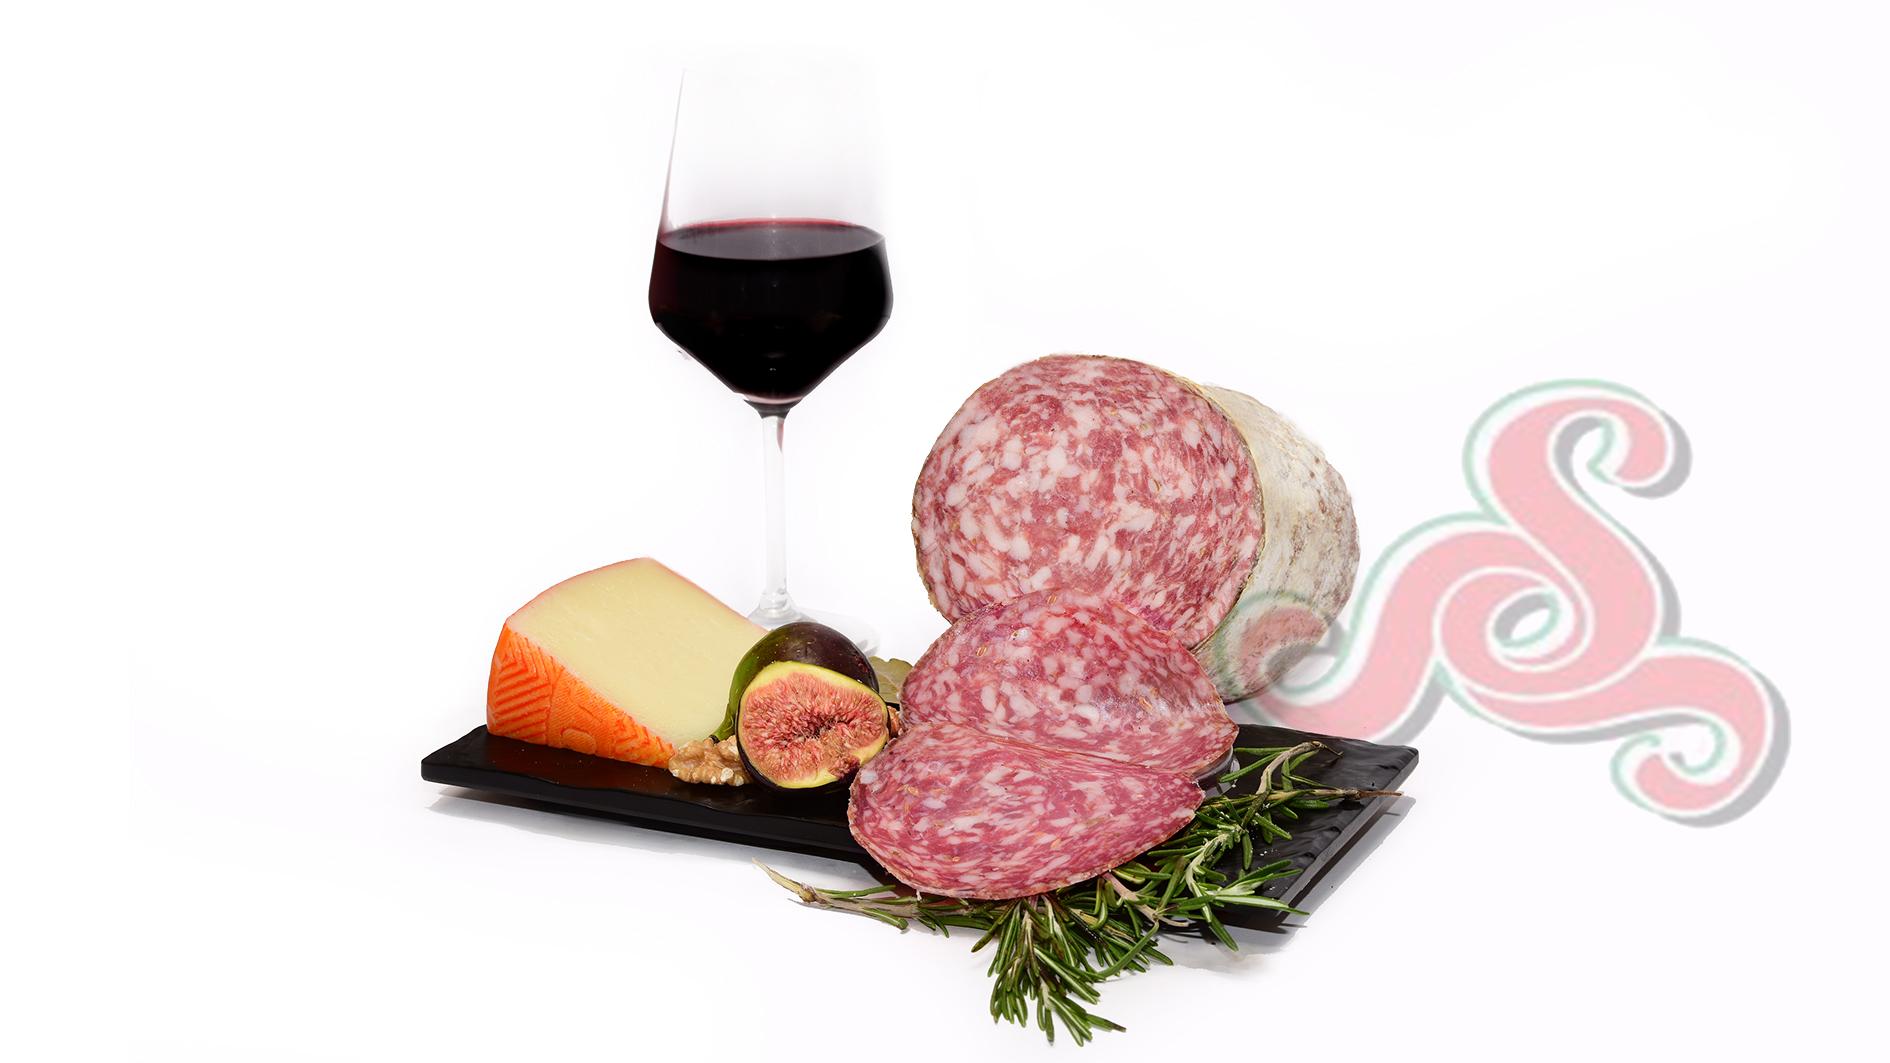 Ital. Fenchel-Pfeffer Salami (Finocchiona-Pepeato)